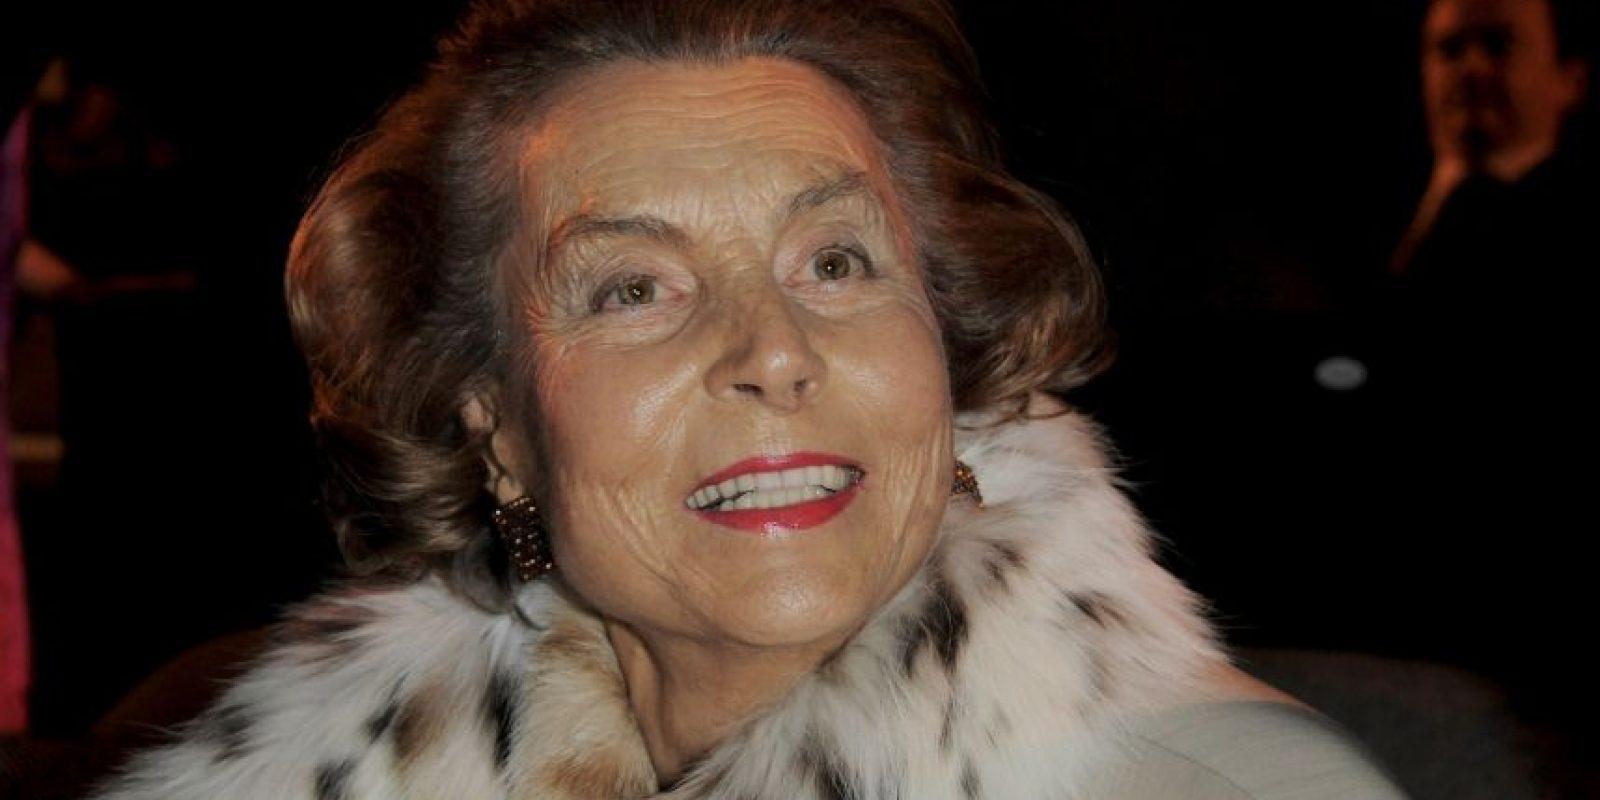 9. Liliane Bettencourt posee $40 mil 100 millones de dólares. Foto:Getty Images